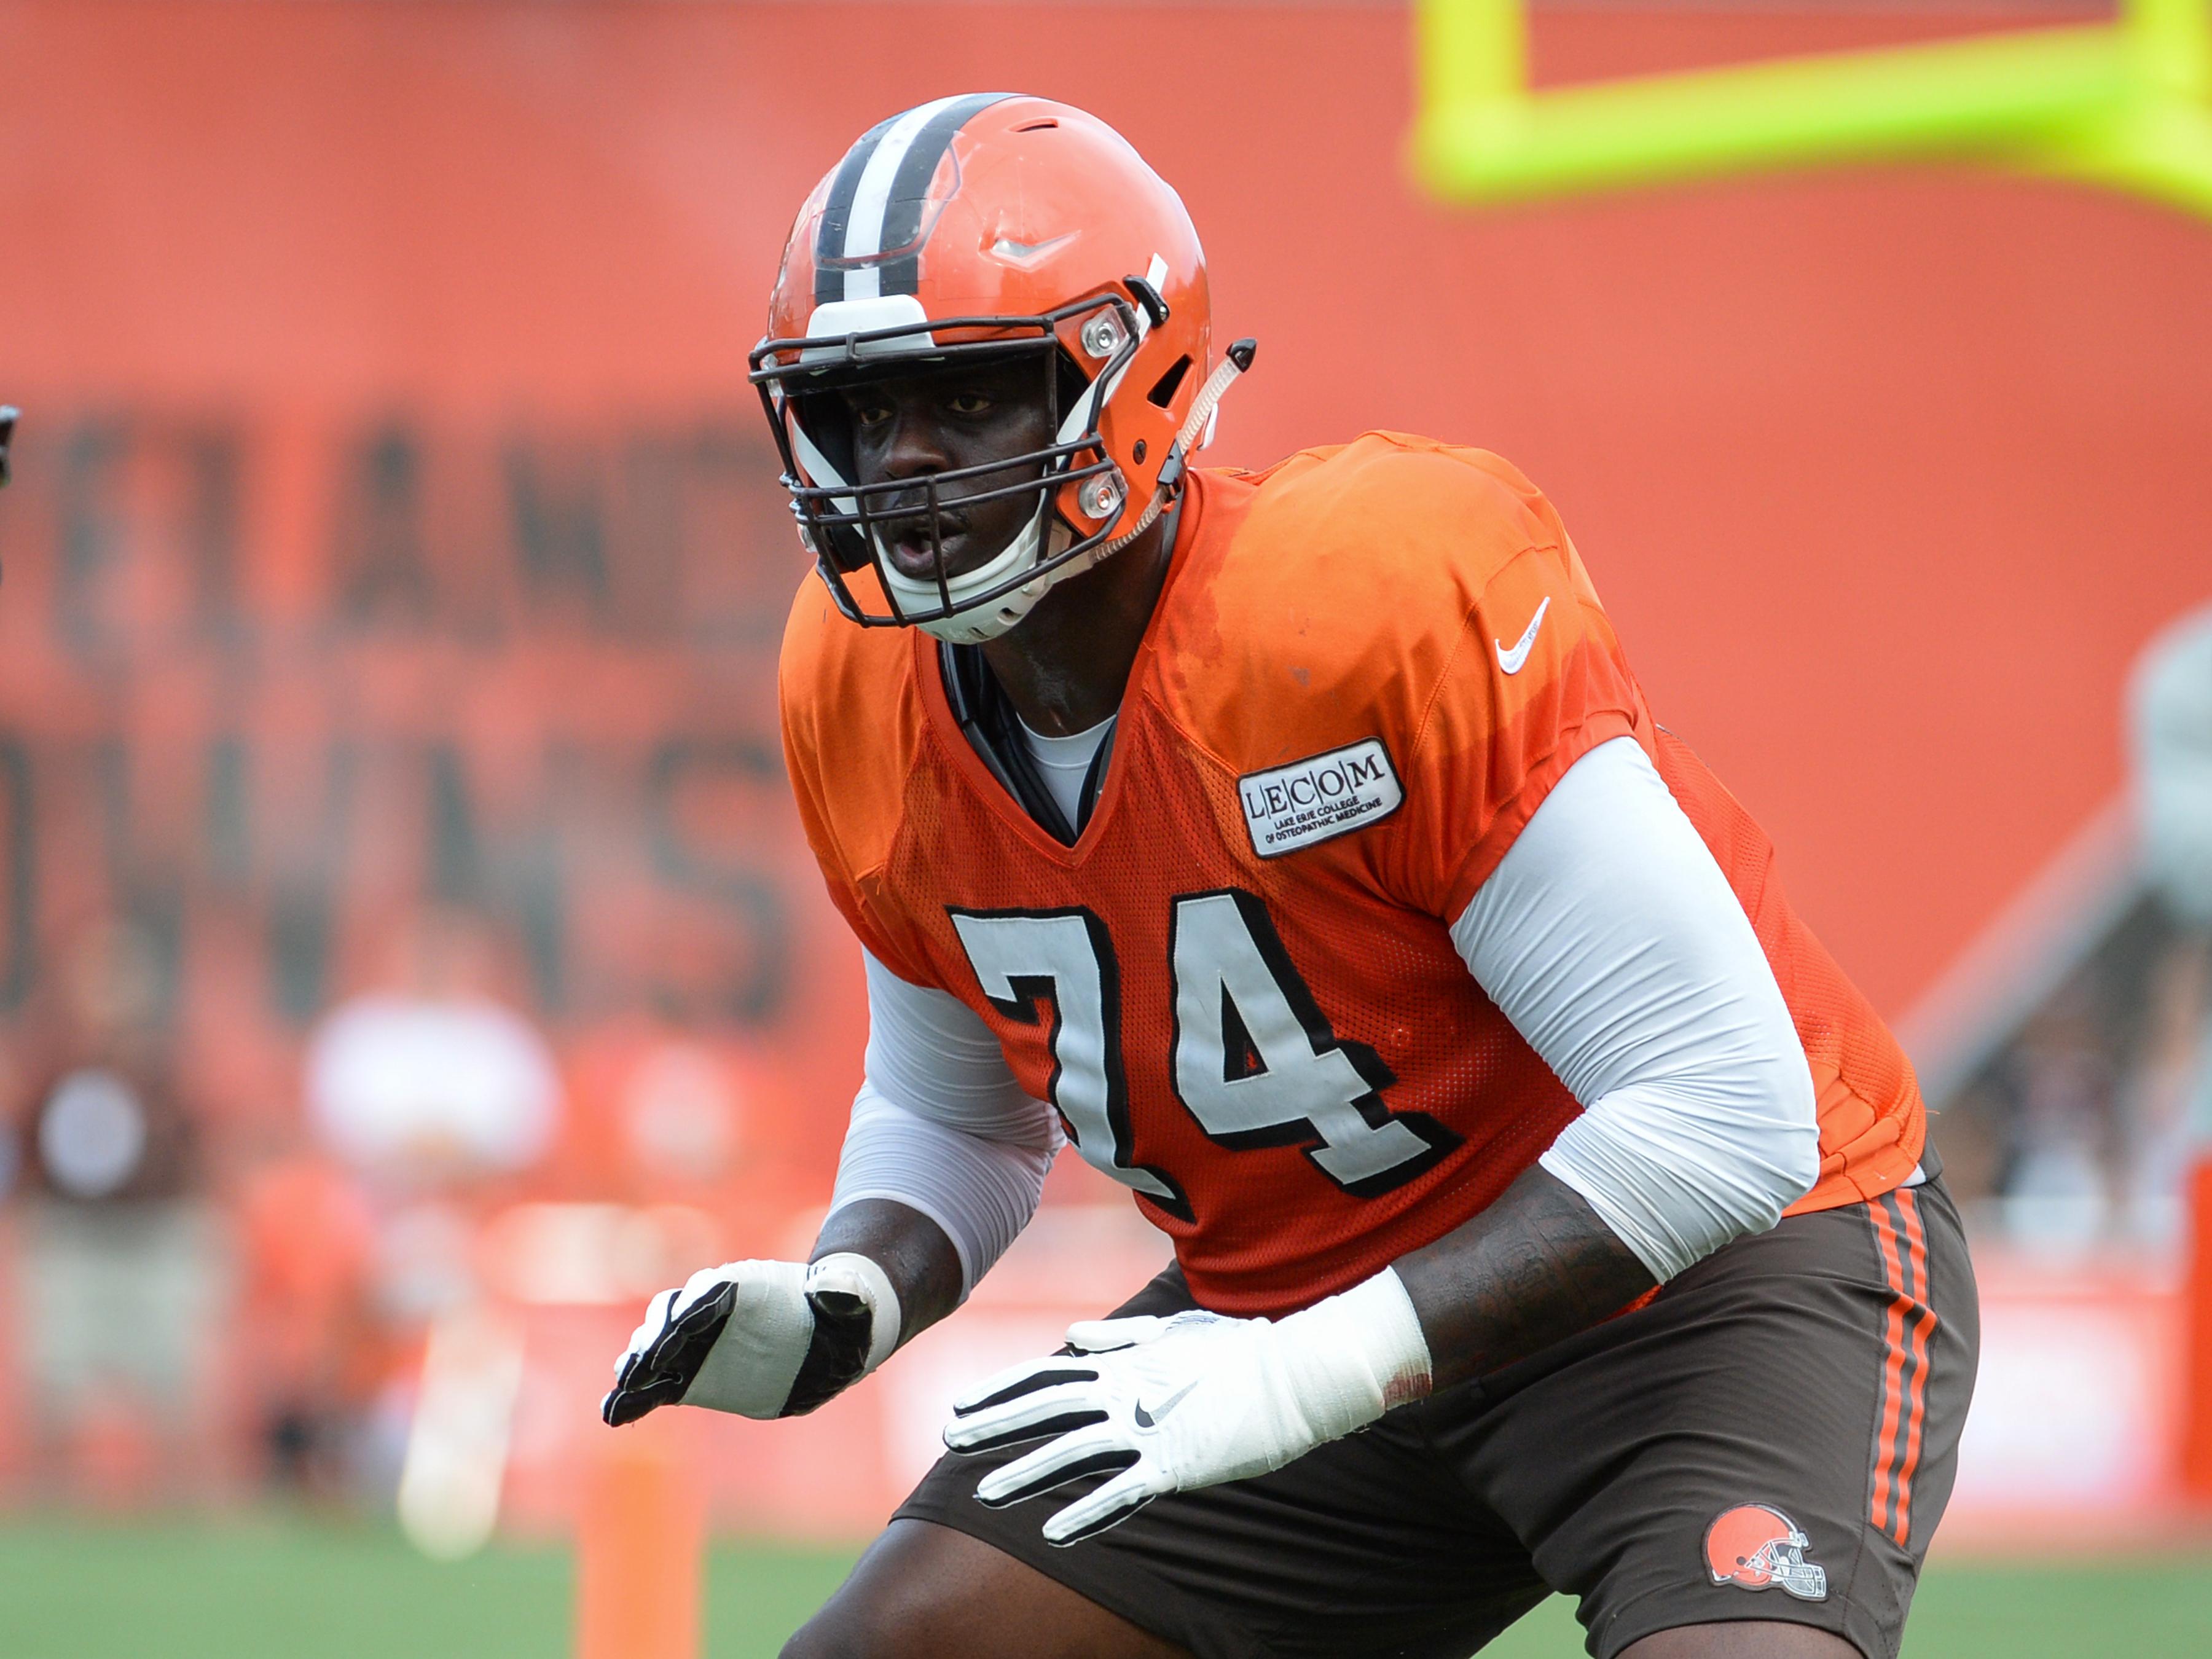 Cameron Erving Cleveland Browns Game Jersey